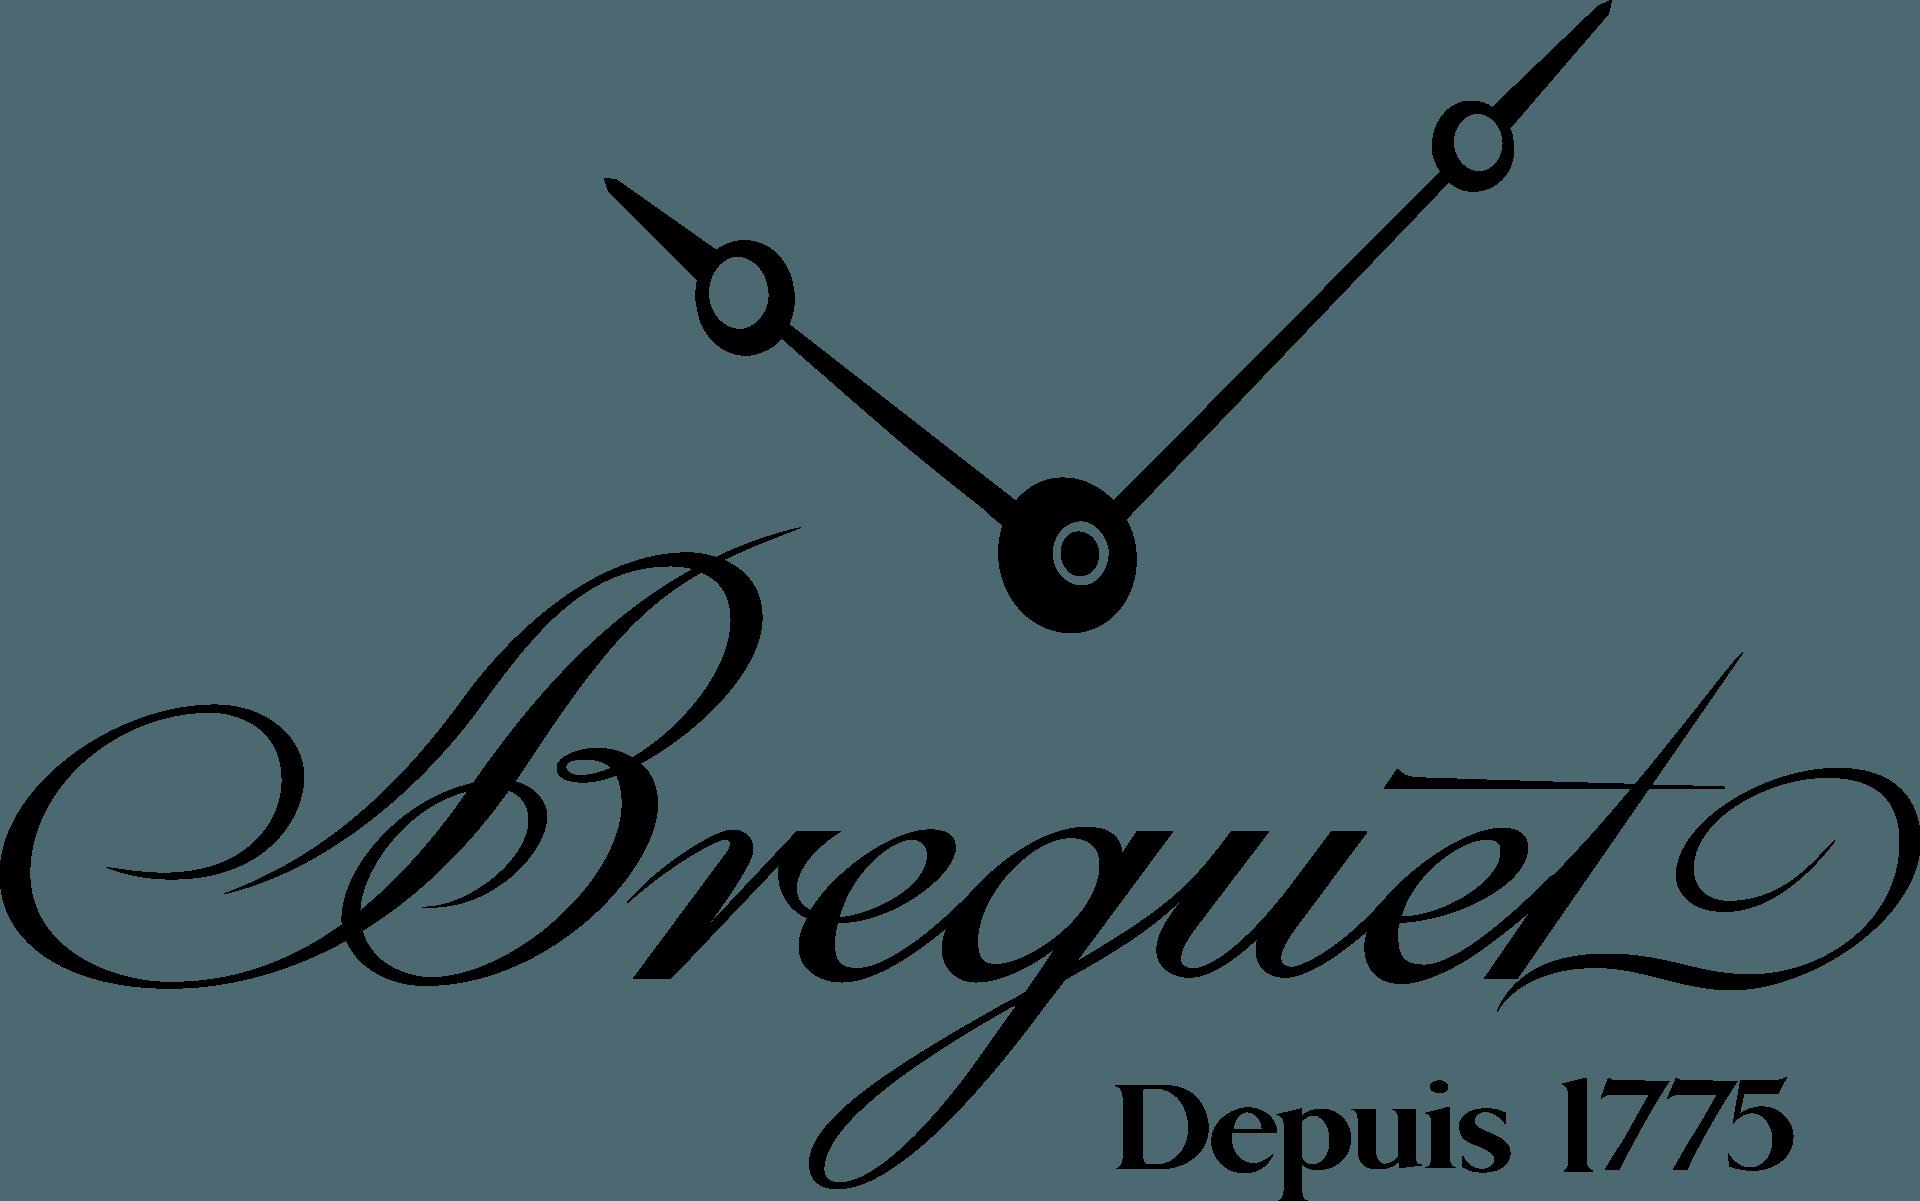 Breguet Logo Download Vector.